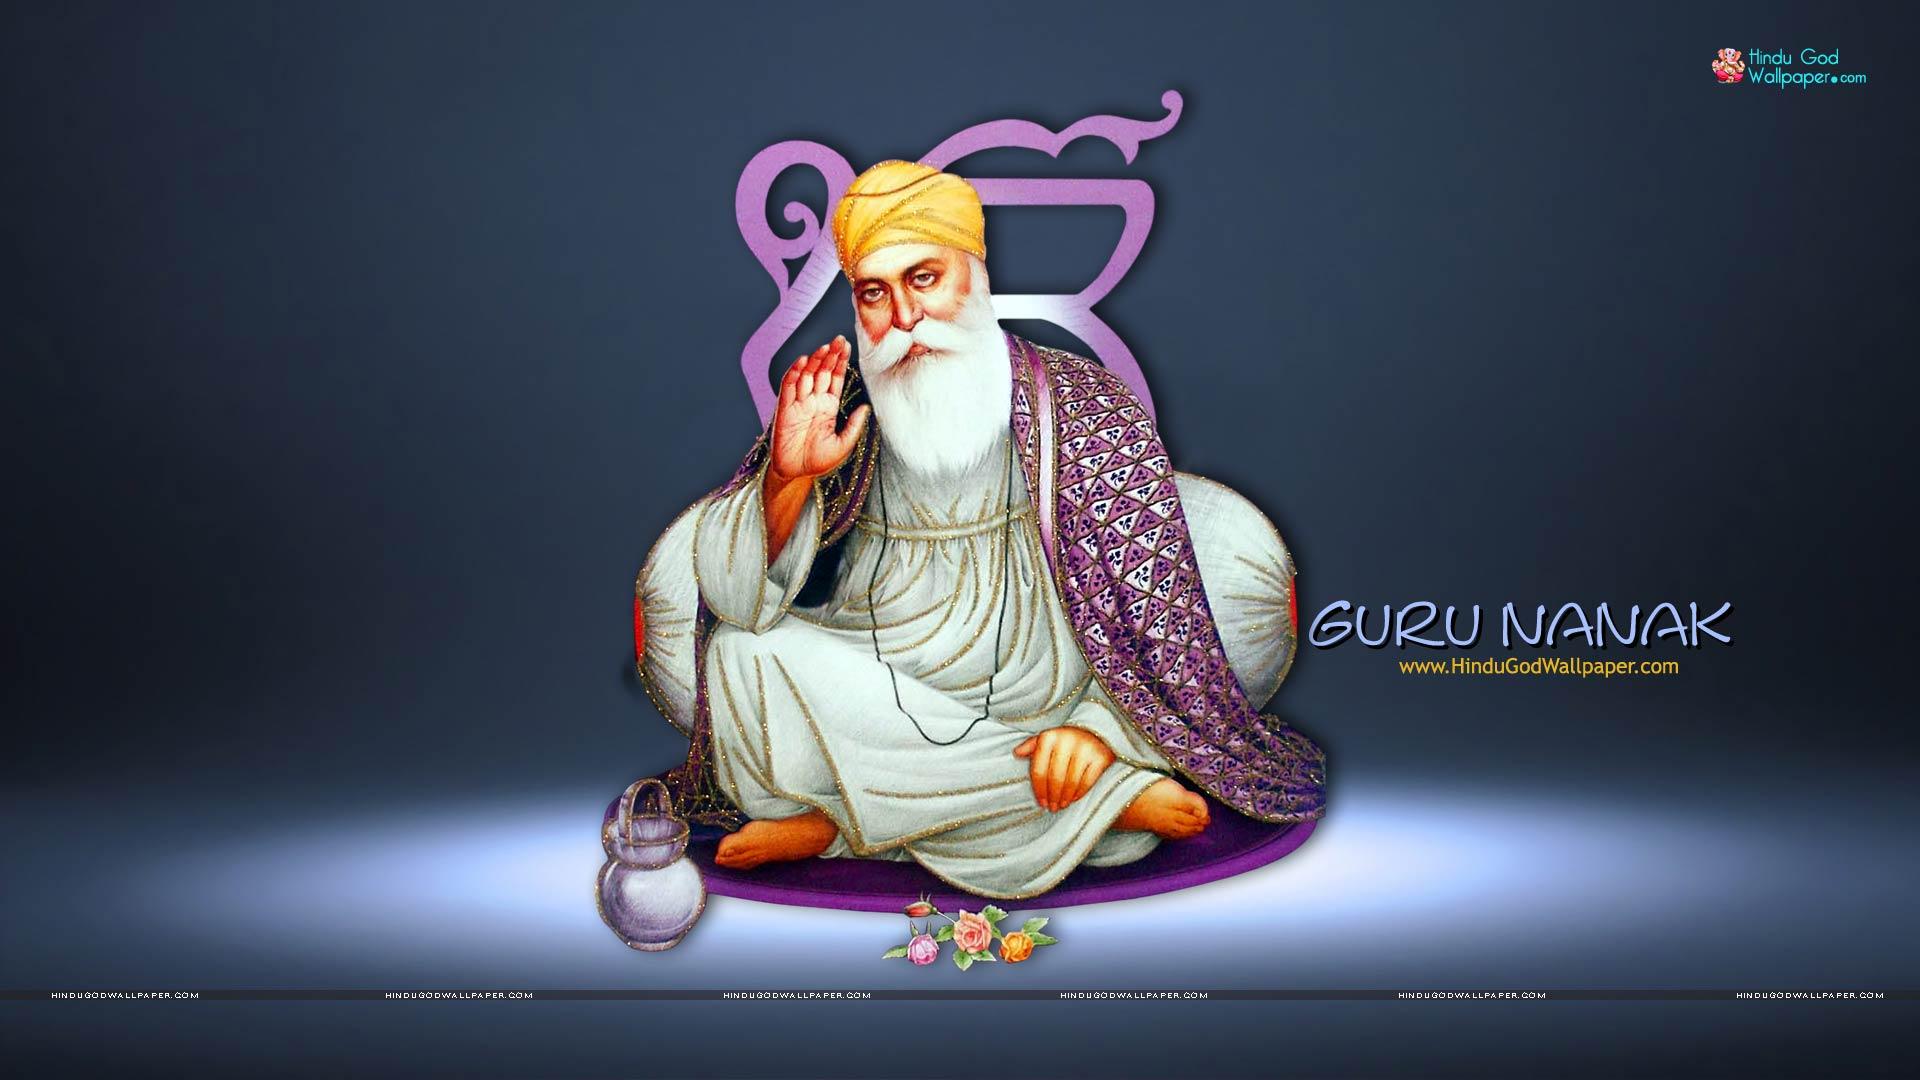 Free download guru nanak dev ji hd wallpaper #12.